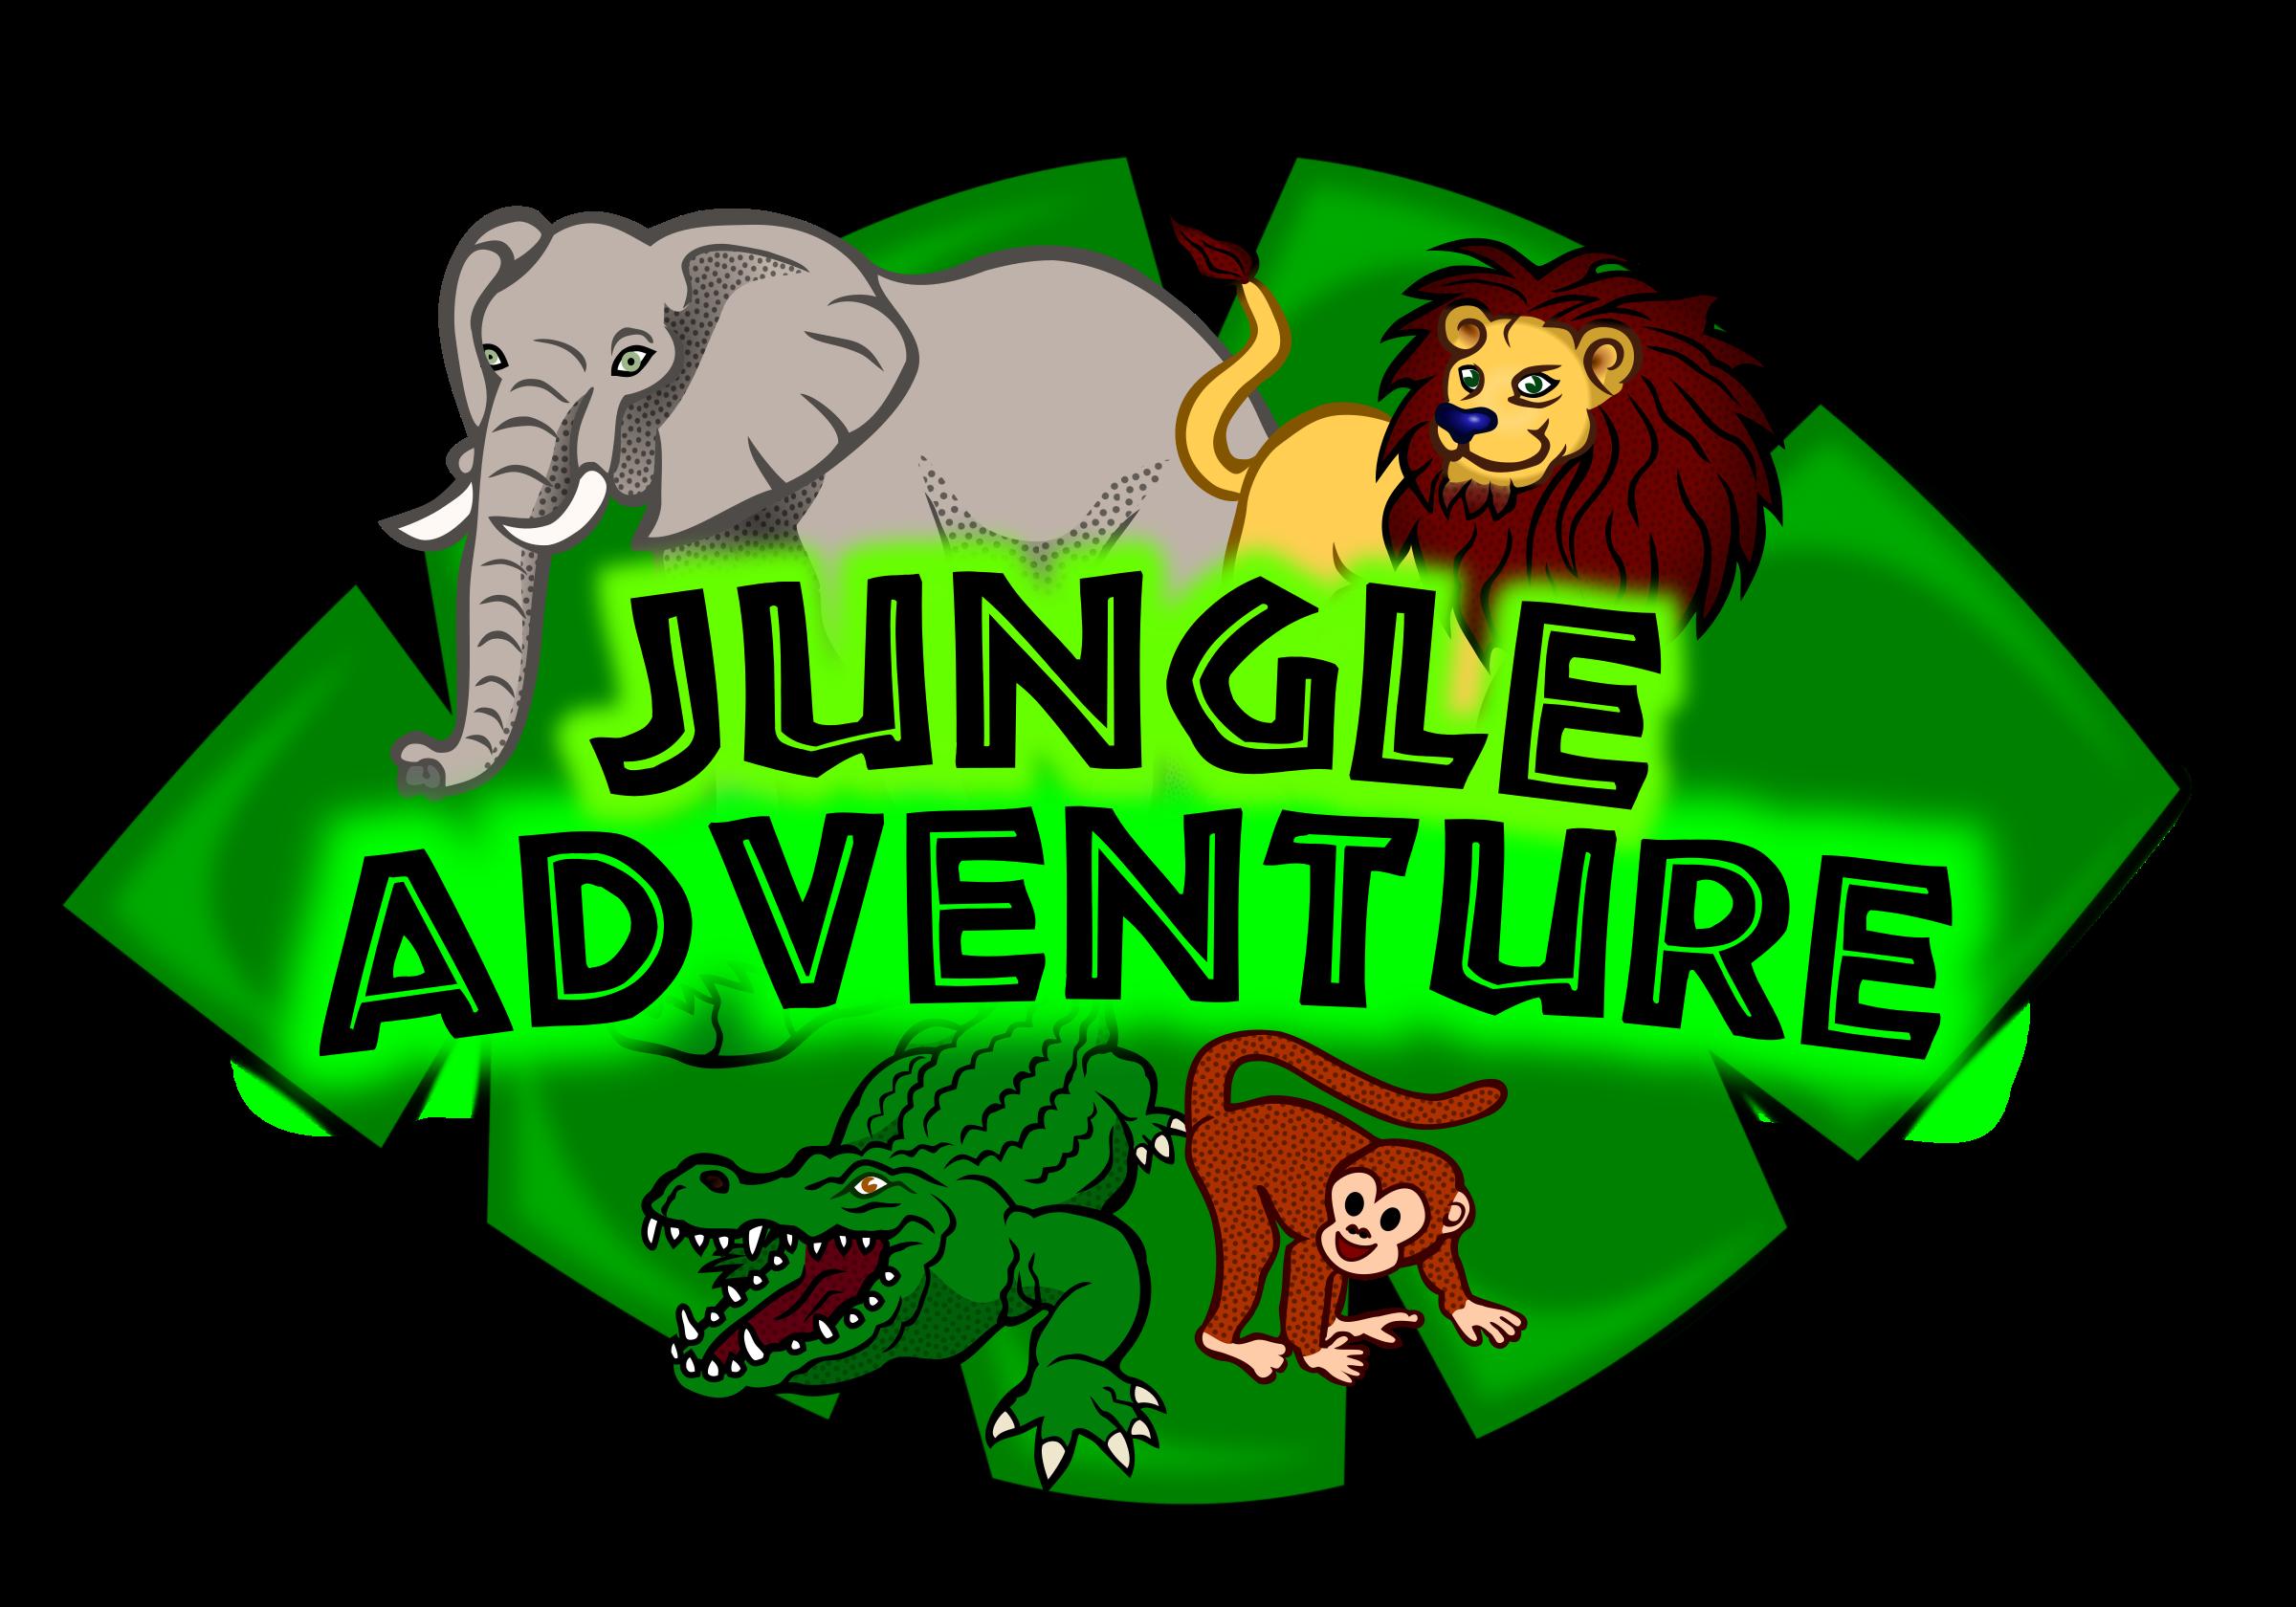 vector download Kids club logo big. Adventure clipart jungle animal